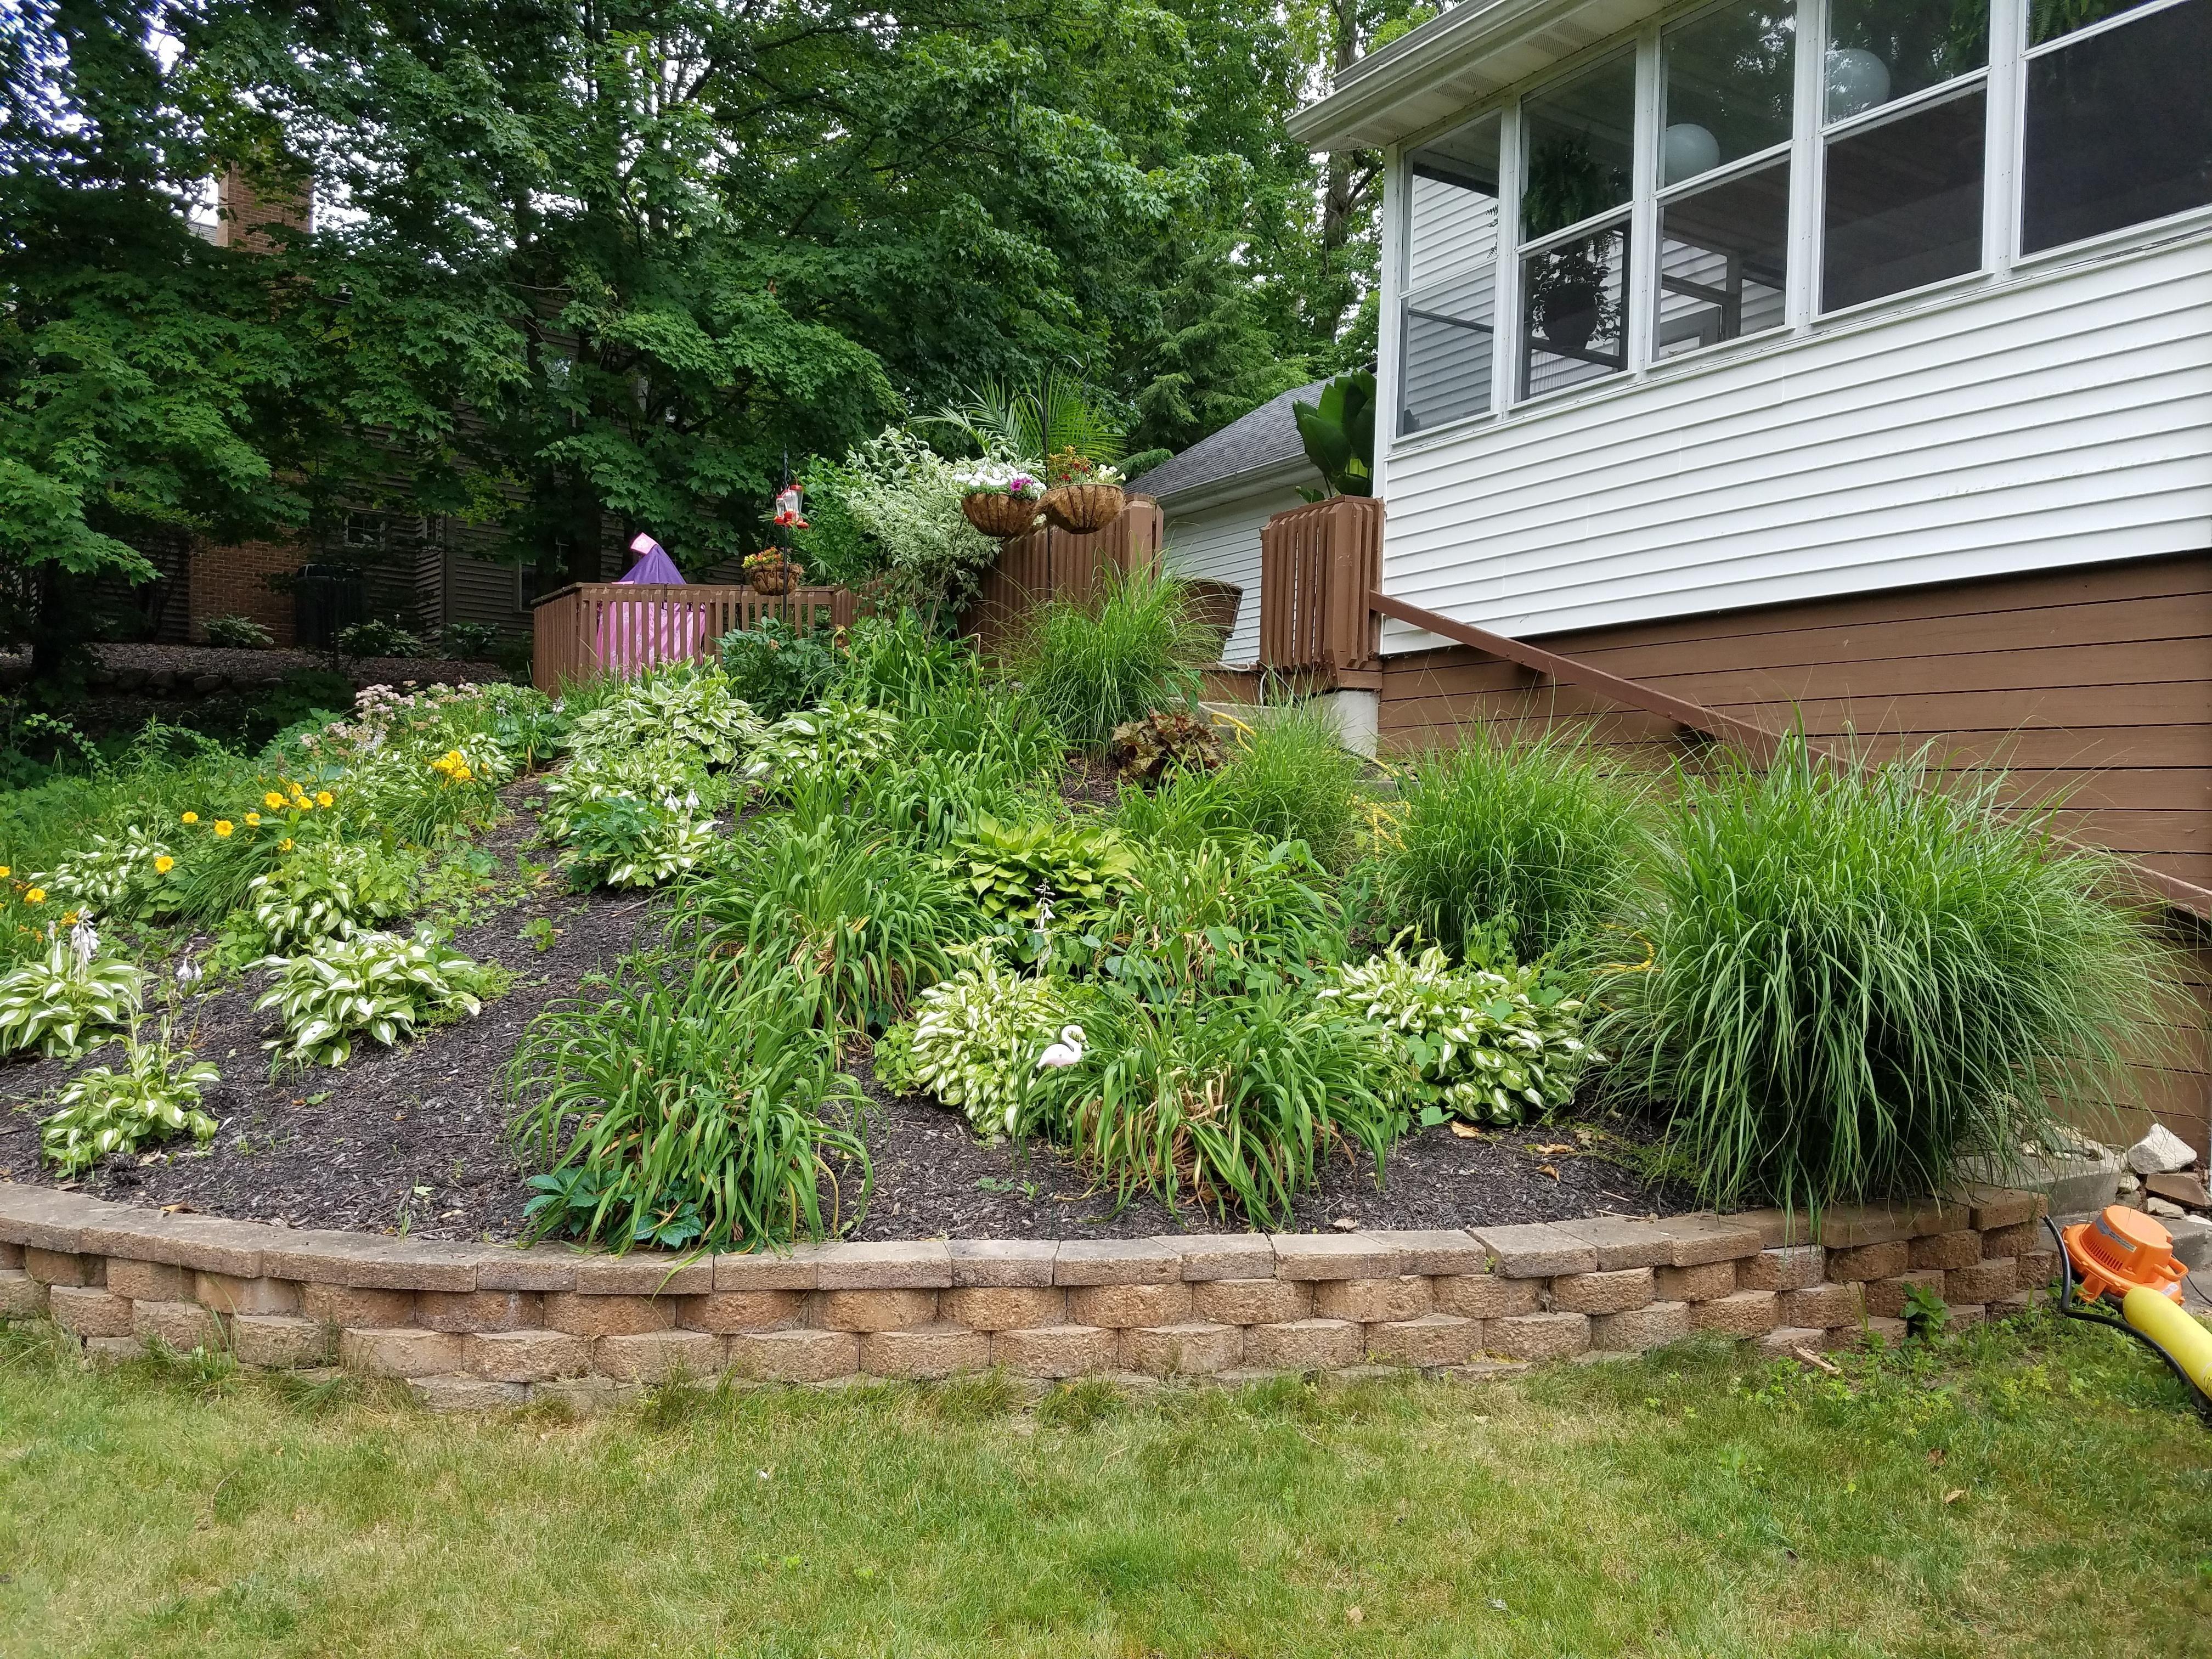 my backyard landscaping i had to wheelbarrow 6 cubic yards of